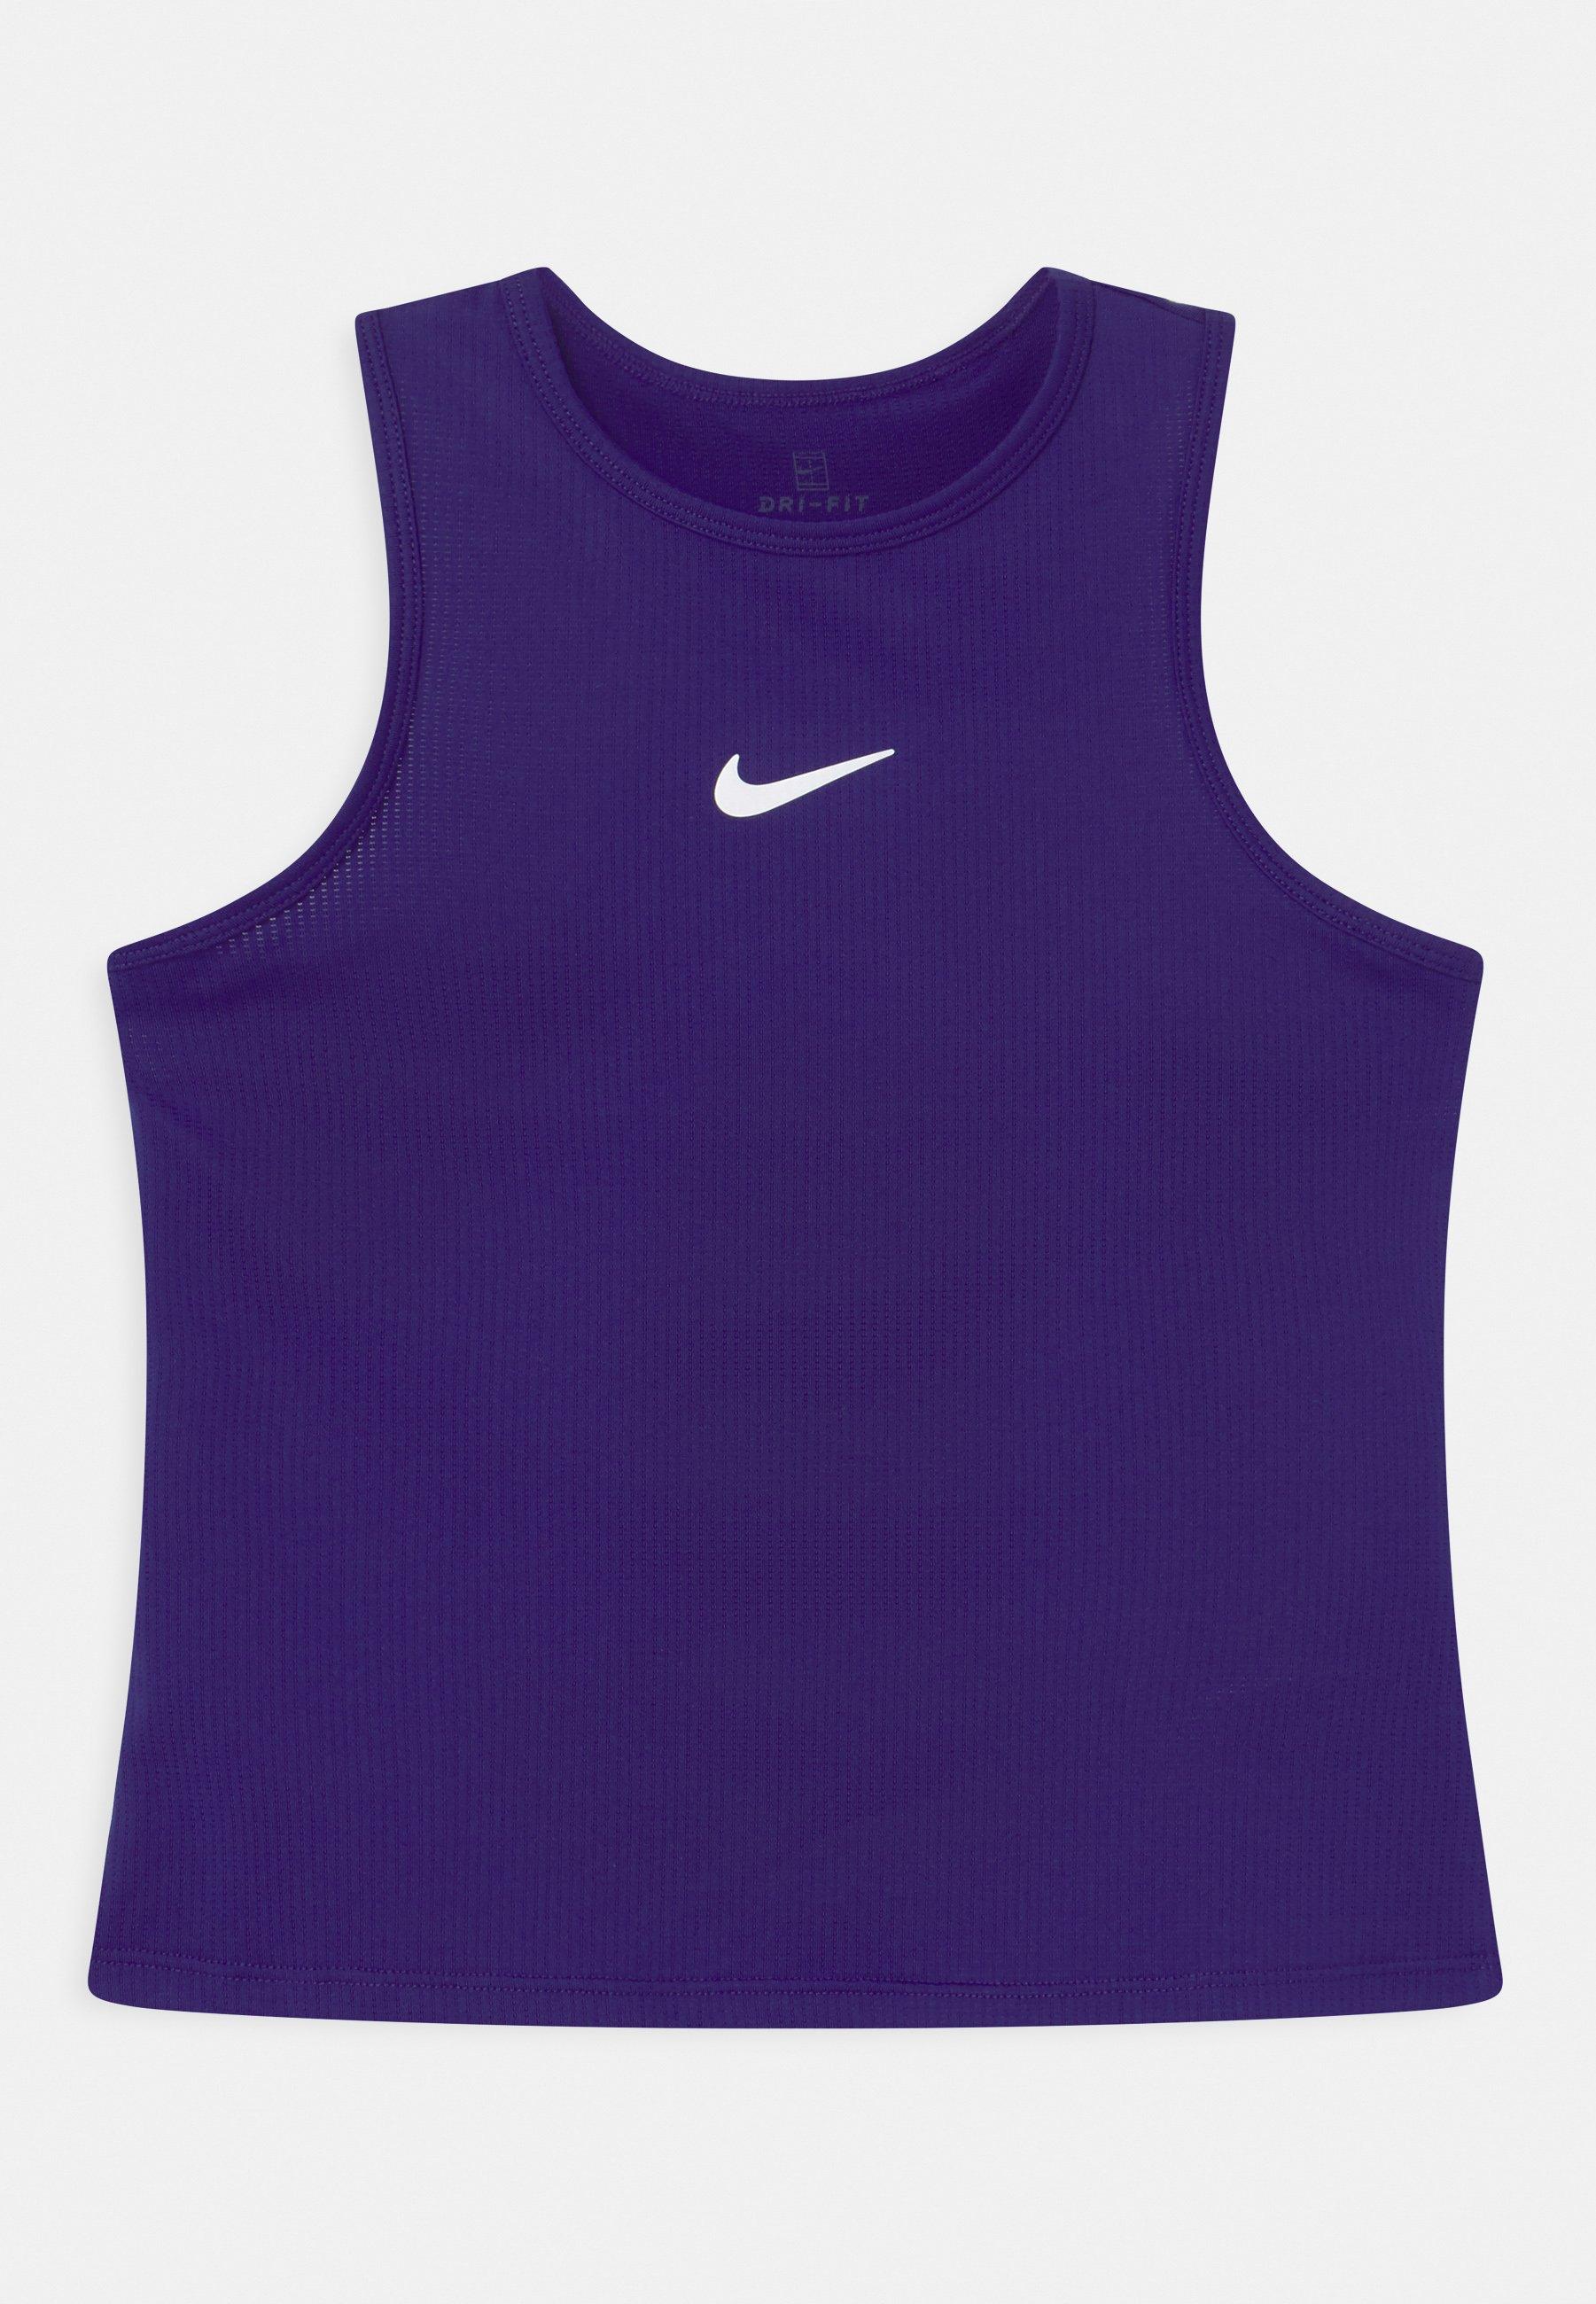 Kids Sports shirt